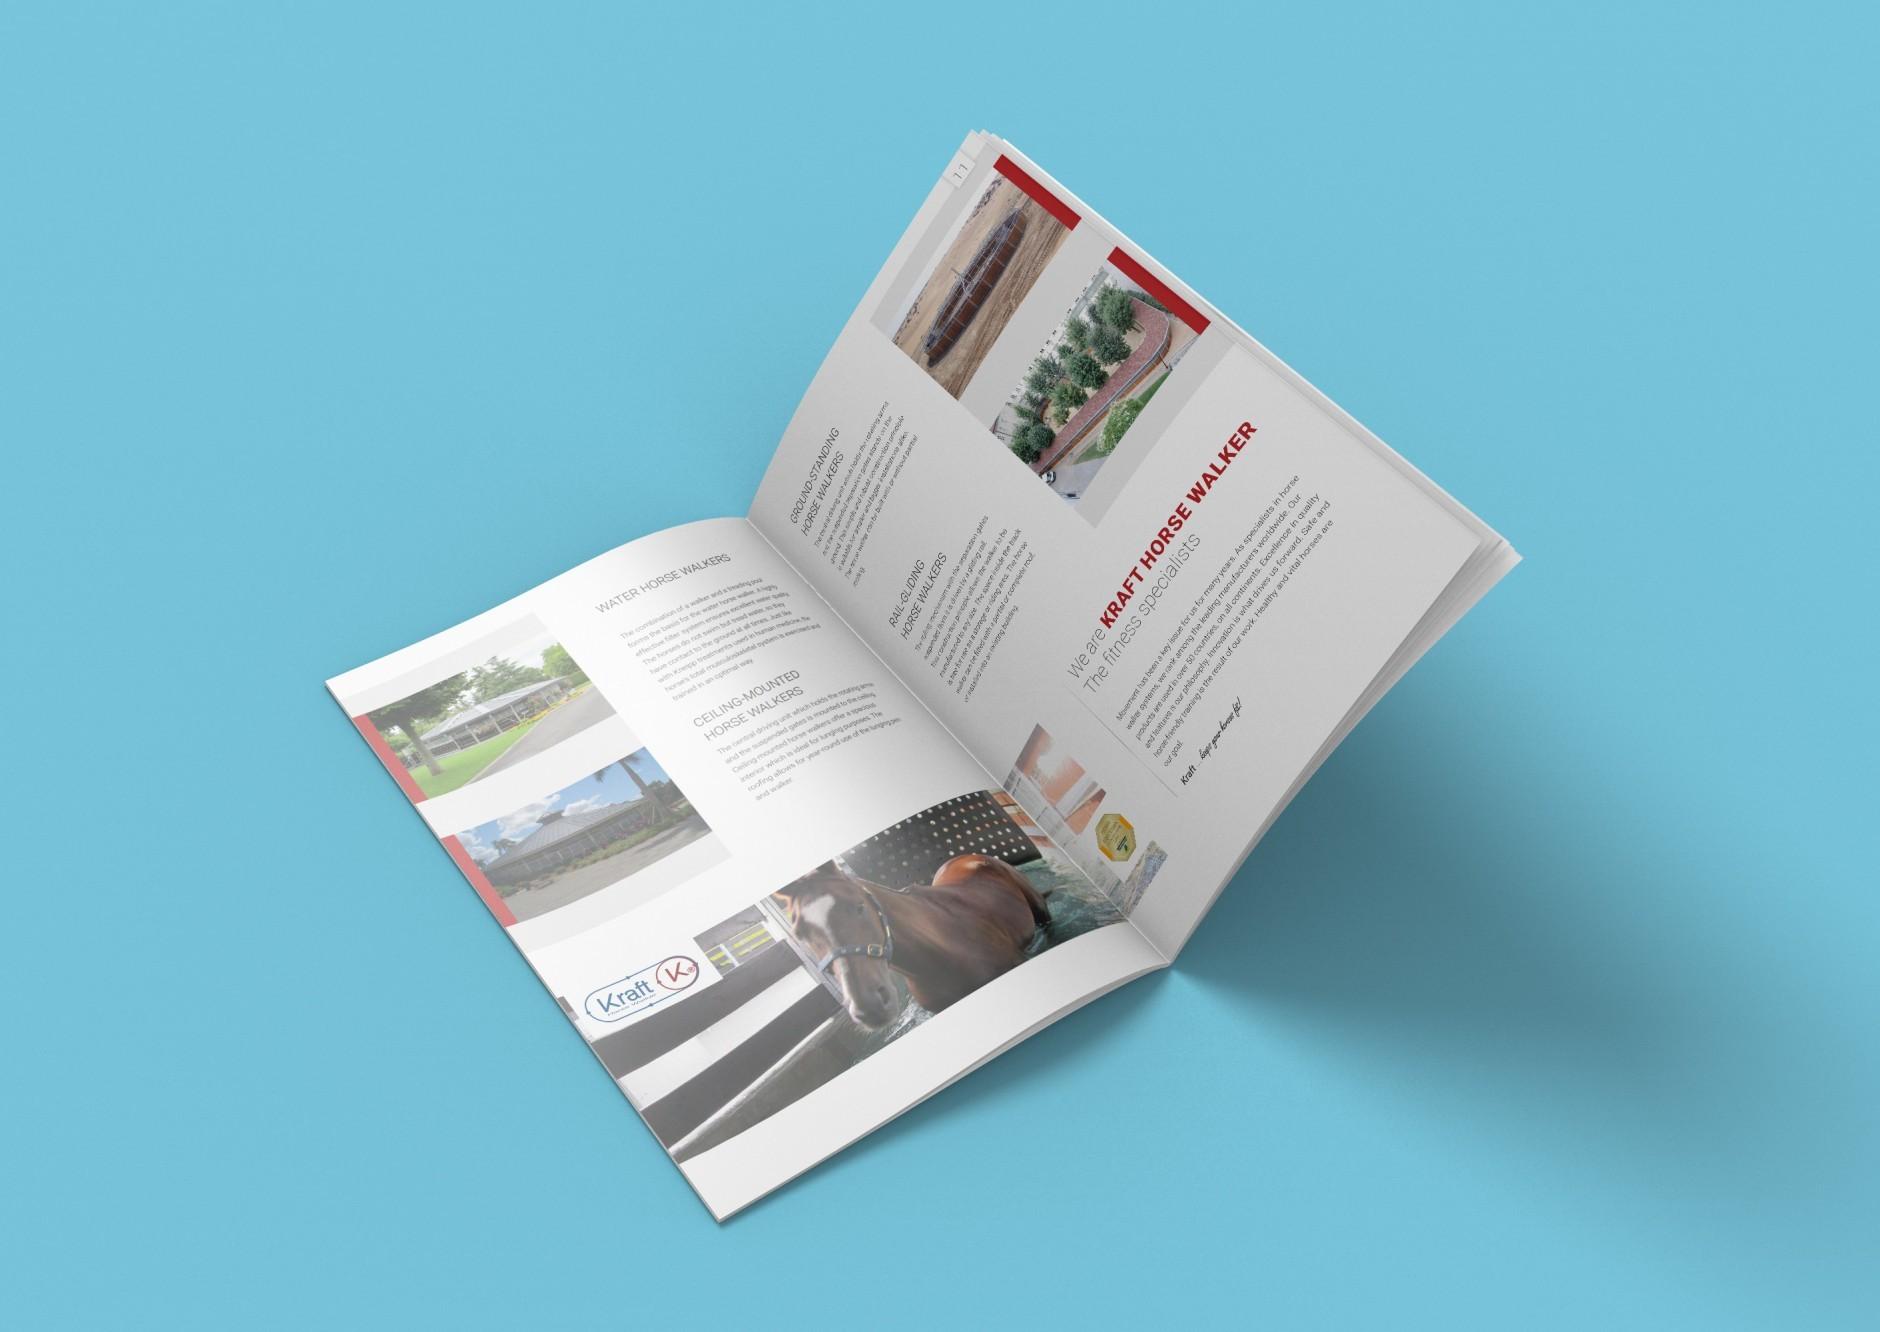 mediensturm_bacher-equus-design-magazin_4-001